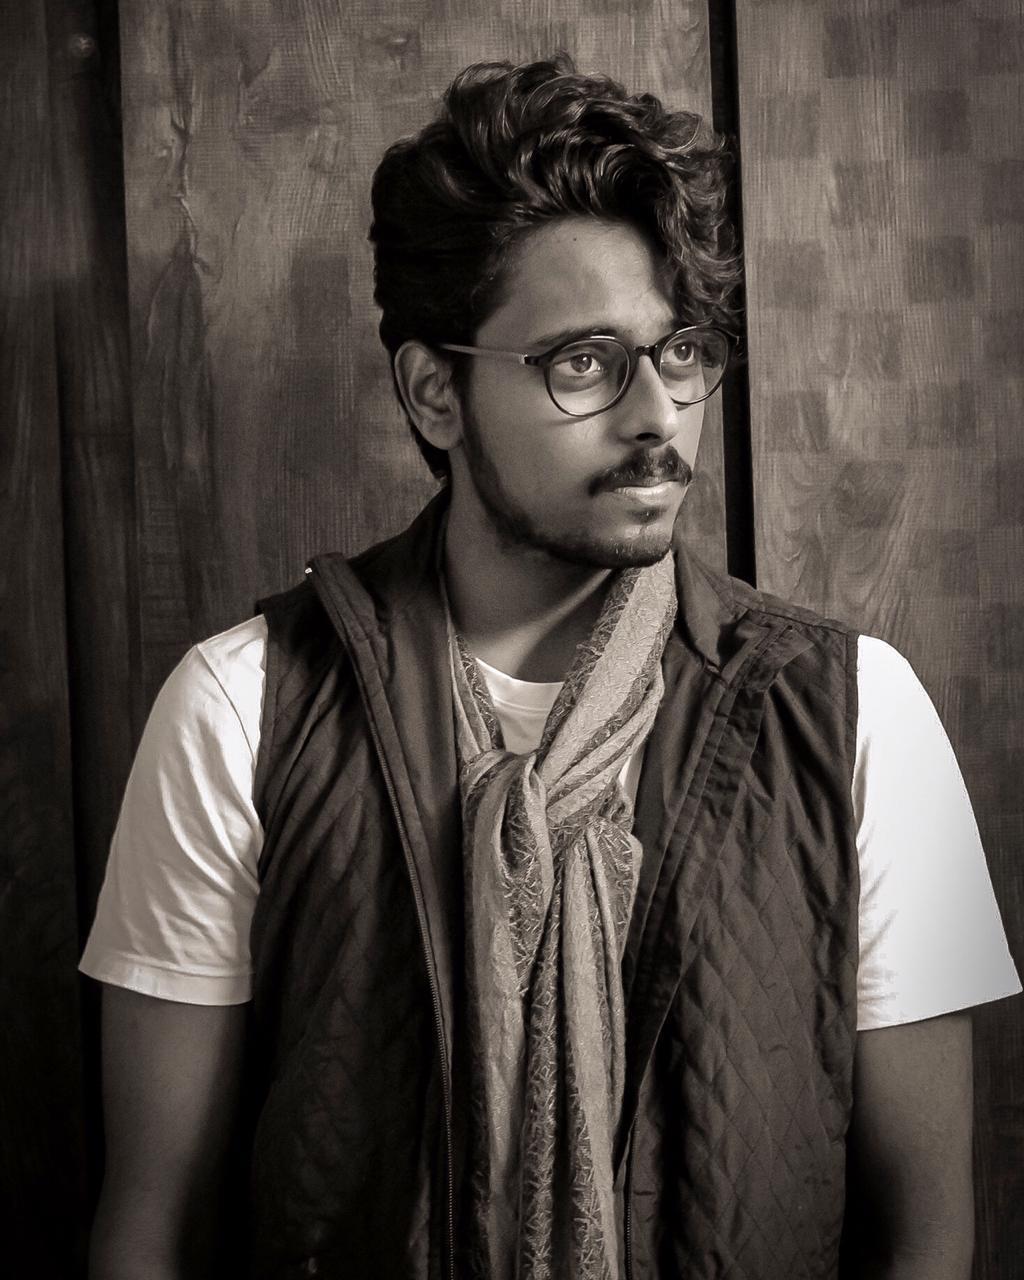 Datta Sai Dheeraj(Dheeraj Datta)- Meet Youngest upcoming fashion model of his generation